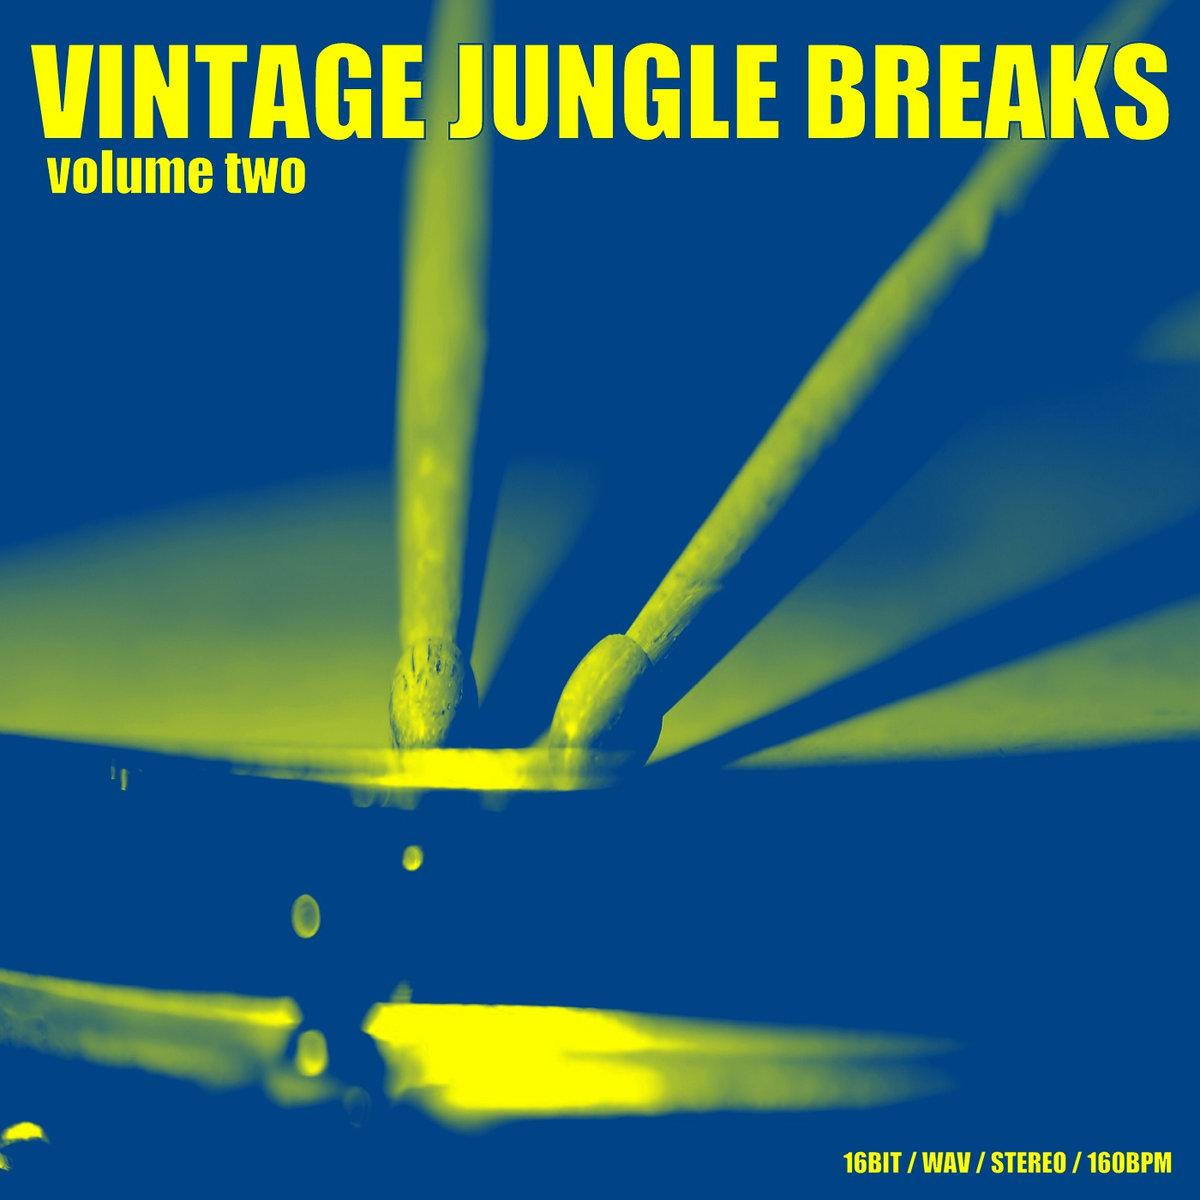 Vintage Jungle Breaks 2 | 6Blocc